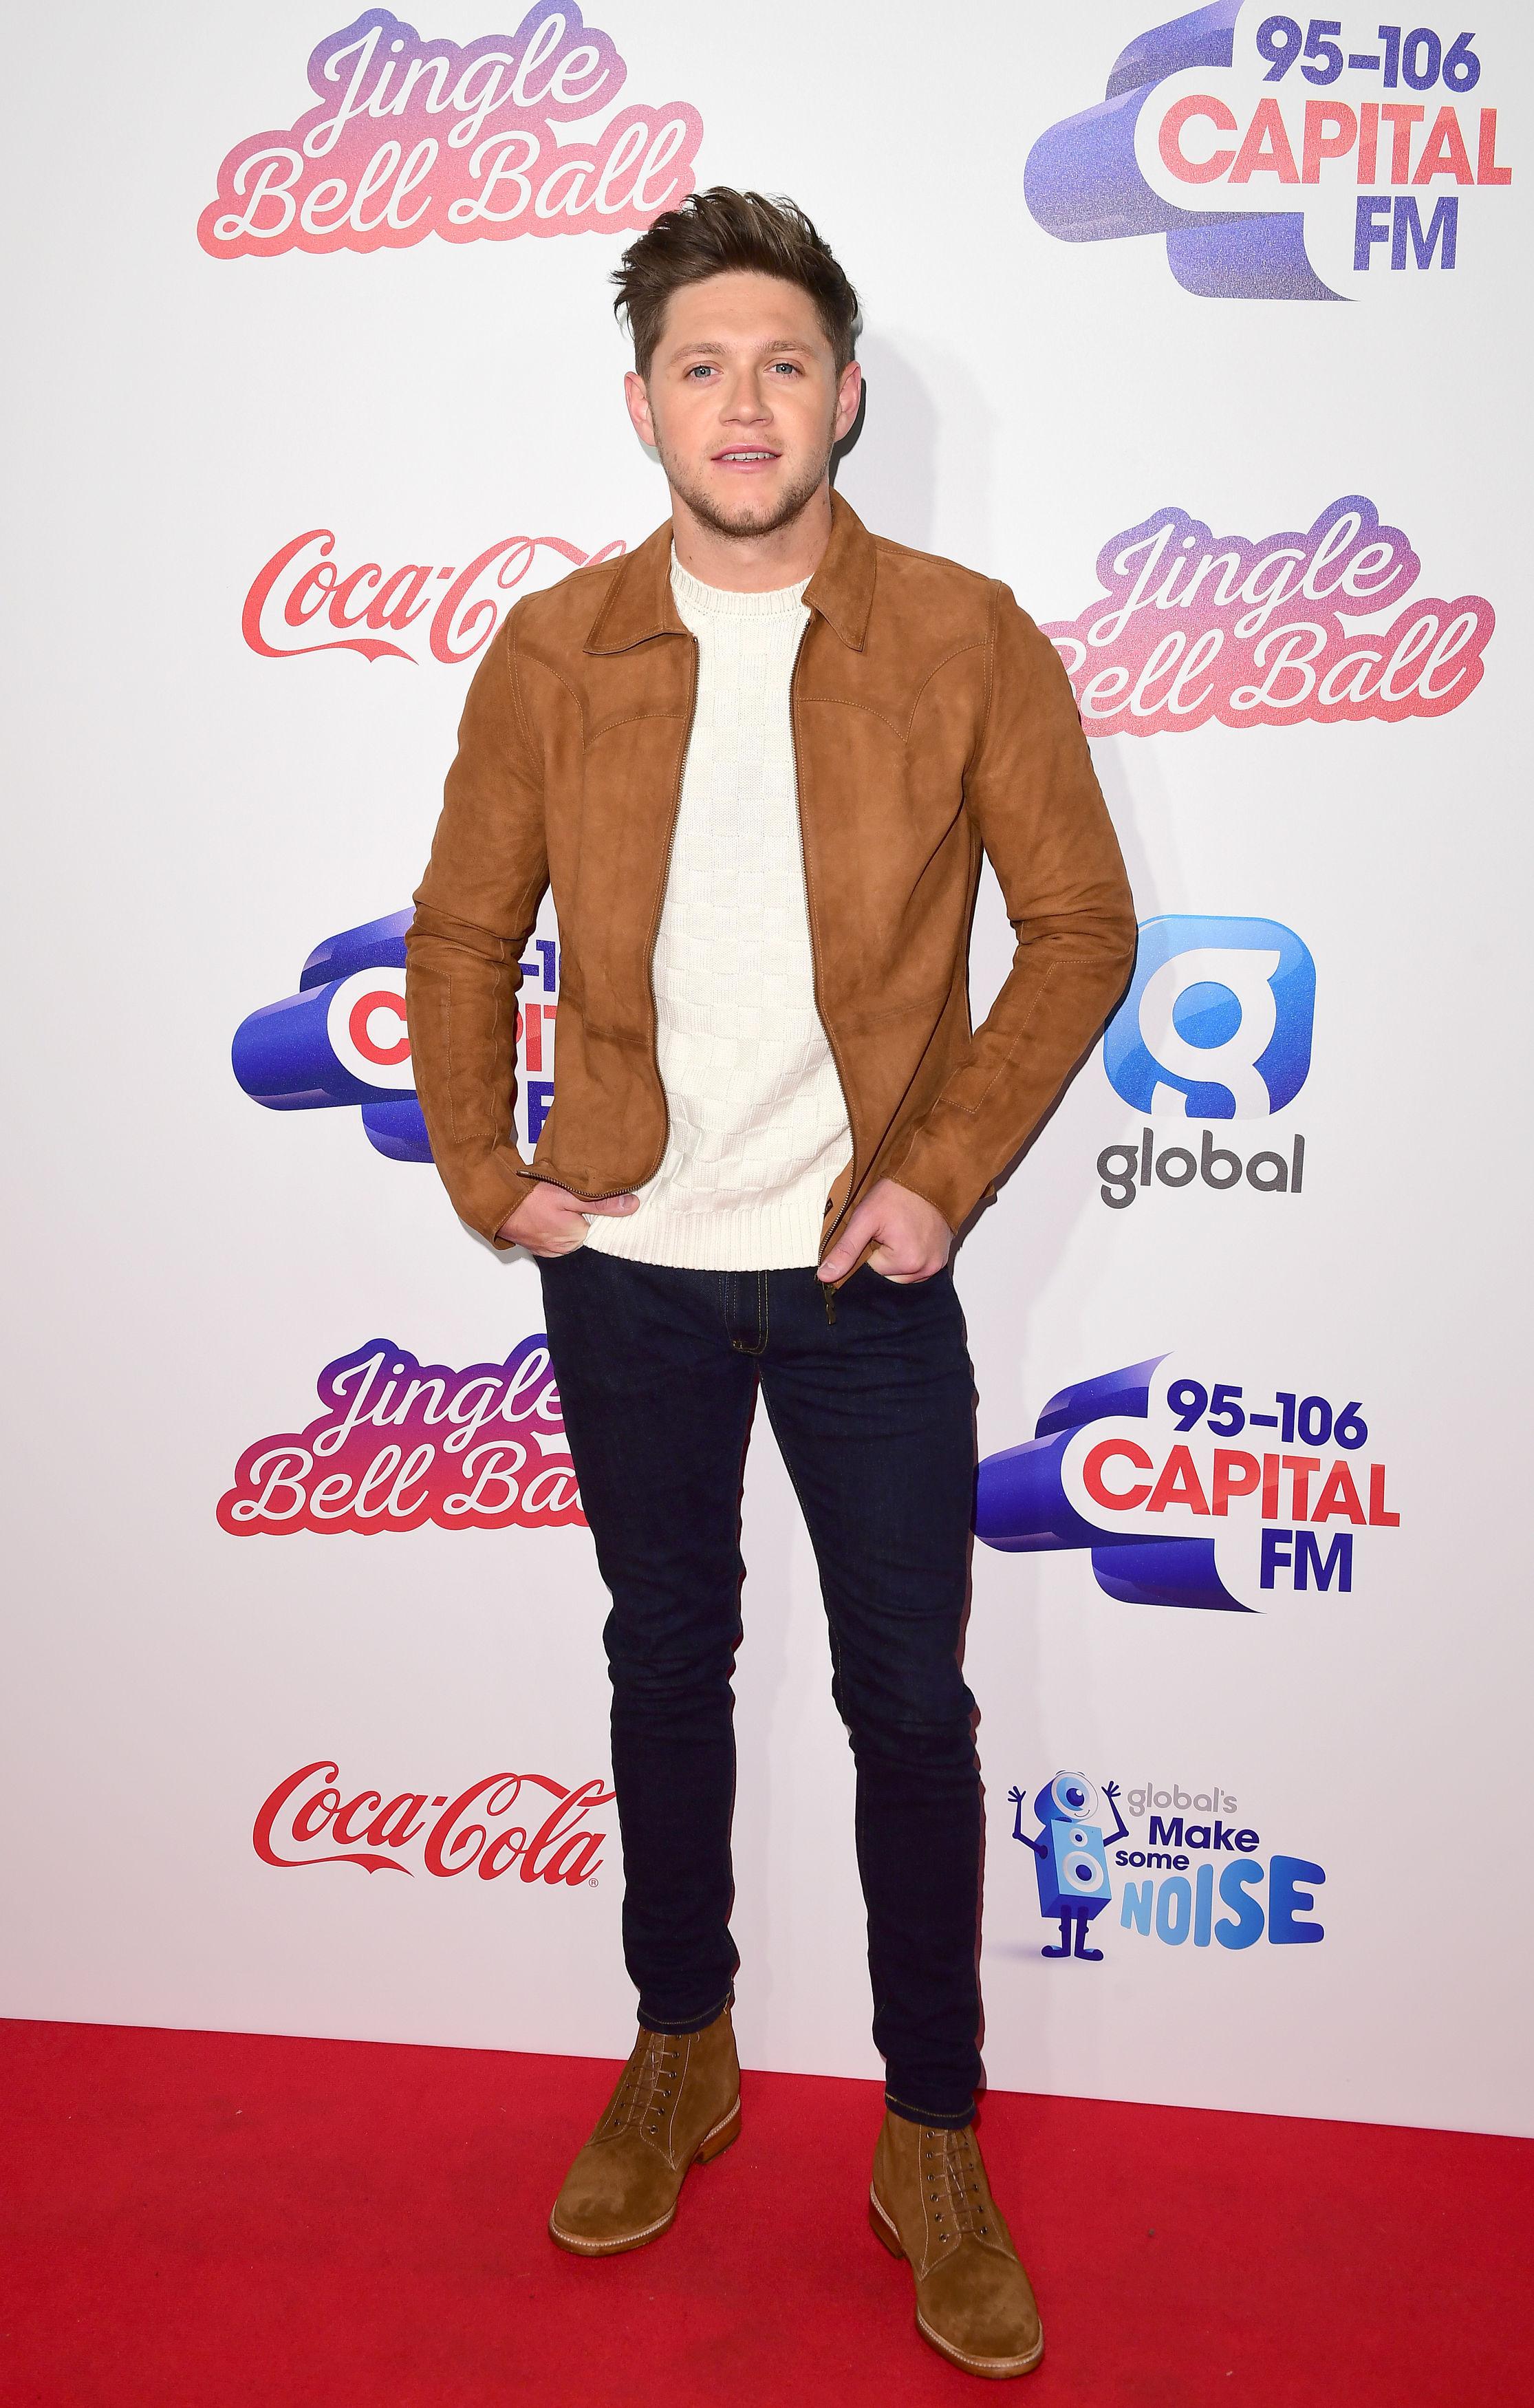 Niall Horan Jingle Bell Ball 2017 red carpet